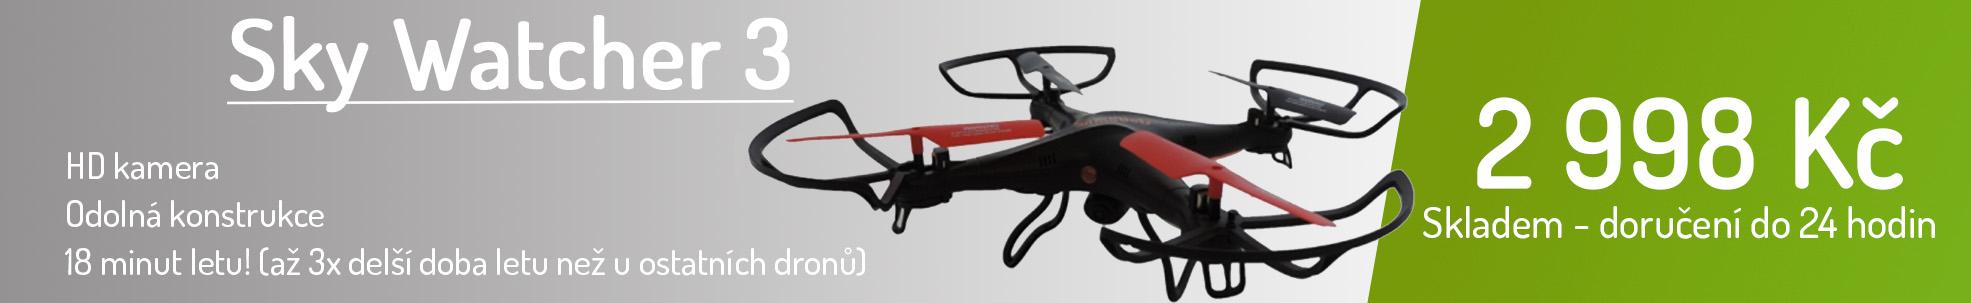 Sky Watcher 3 - RC dron, HD kamera, skladem